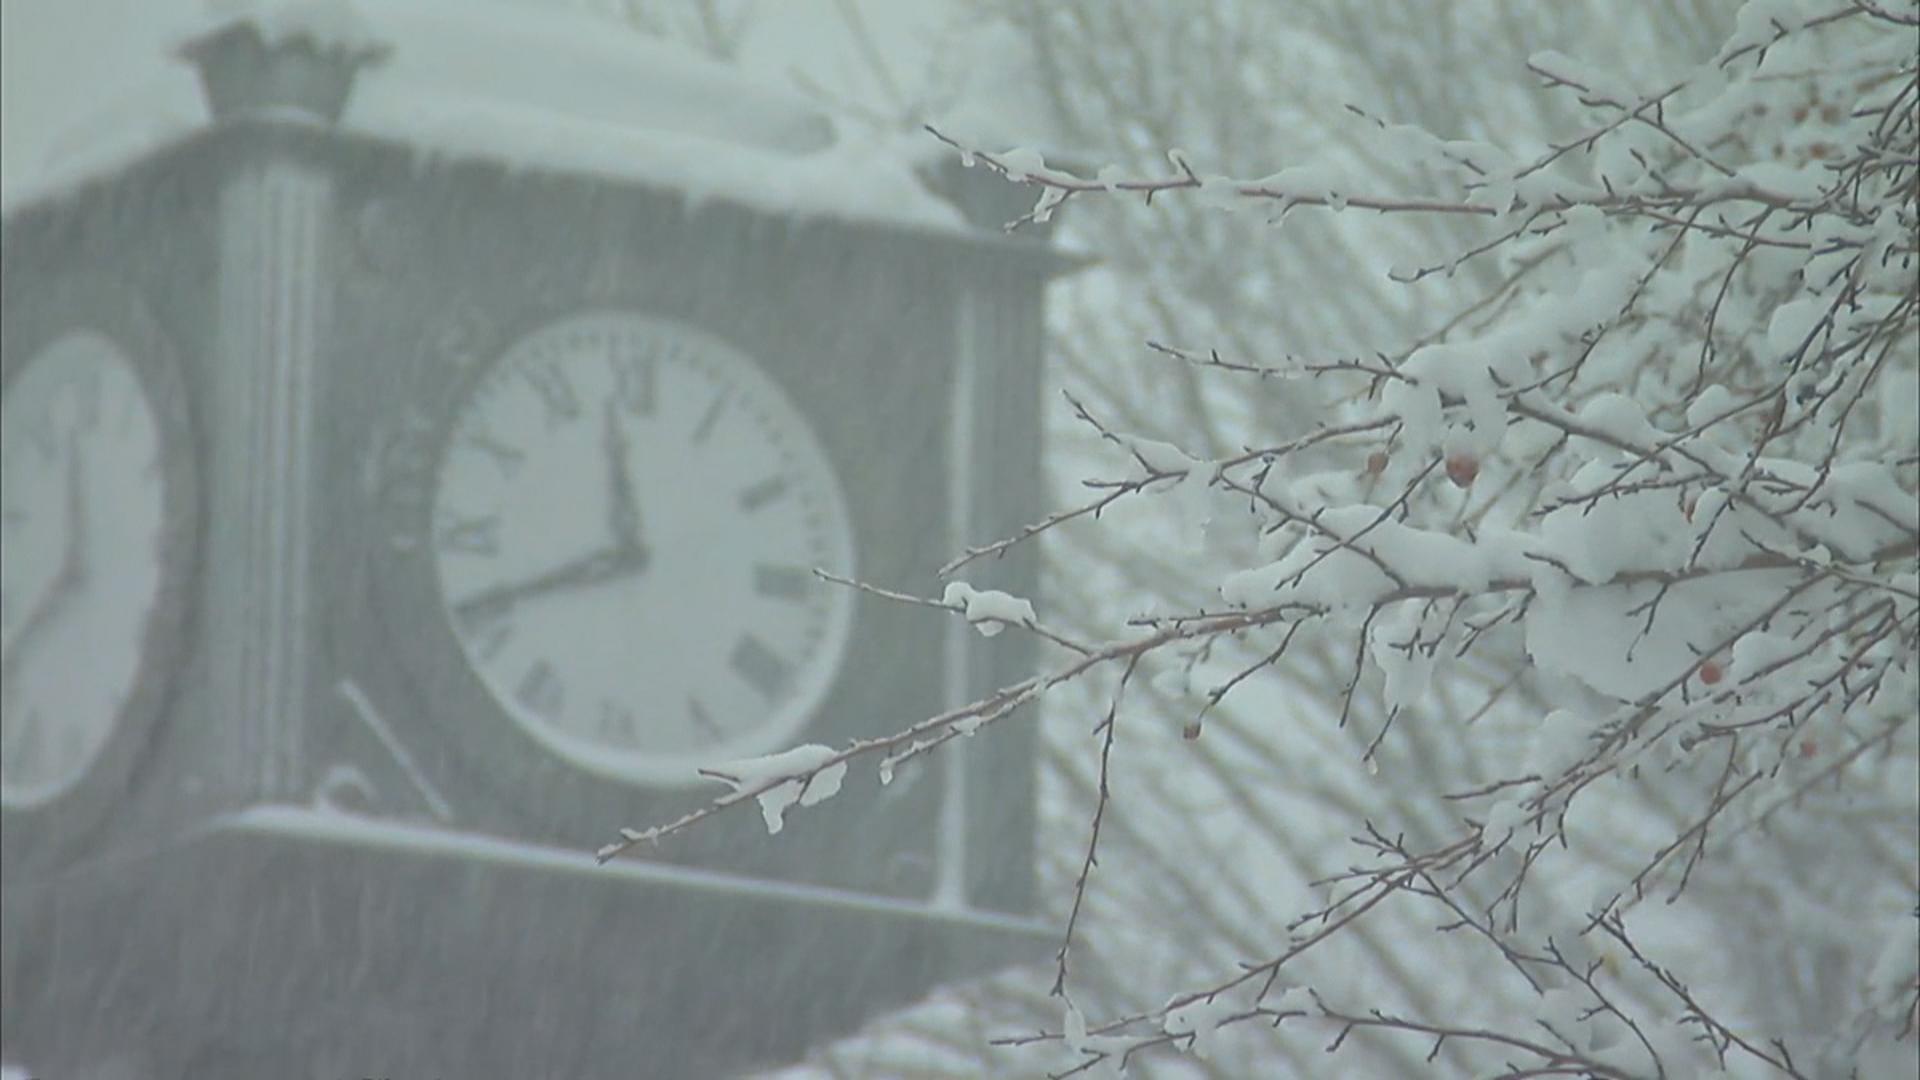 Early Winter Blast: Record Snowfall Hits Midwest - NBC News